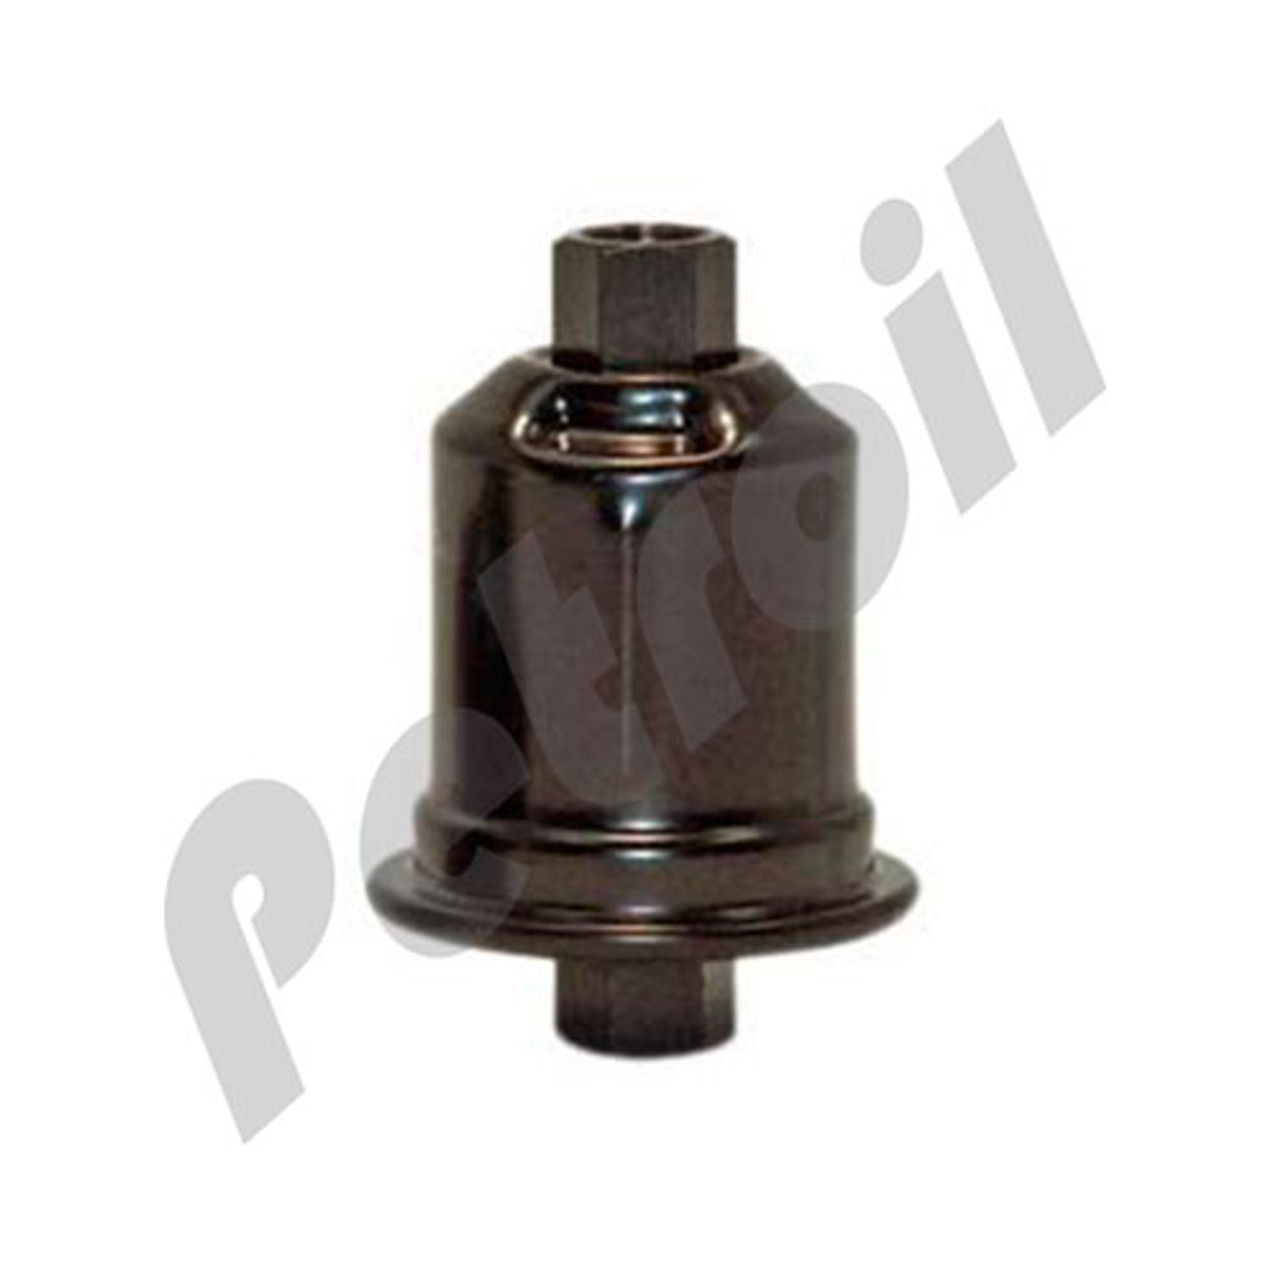 Wix Fuel Filter Toyota Tundra V8 4 7Lts Y V6 4 0Lts (06-09) BF7961 P226 | Tundra Fuel Filter |  | Petroil USA